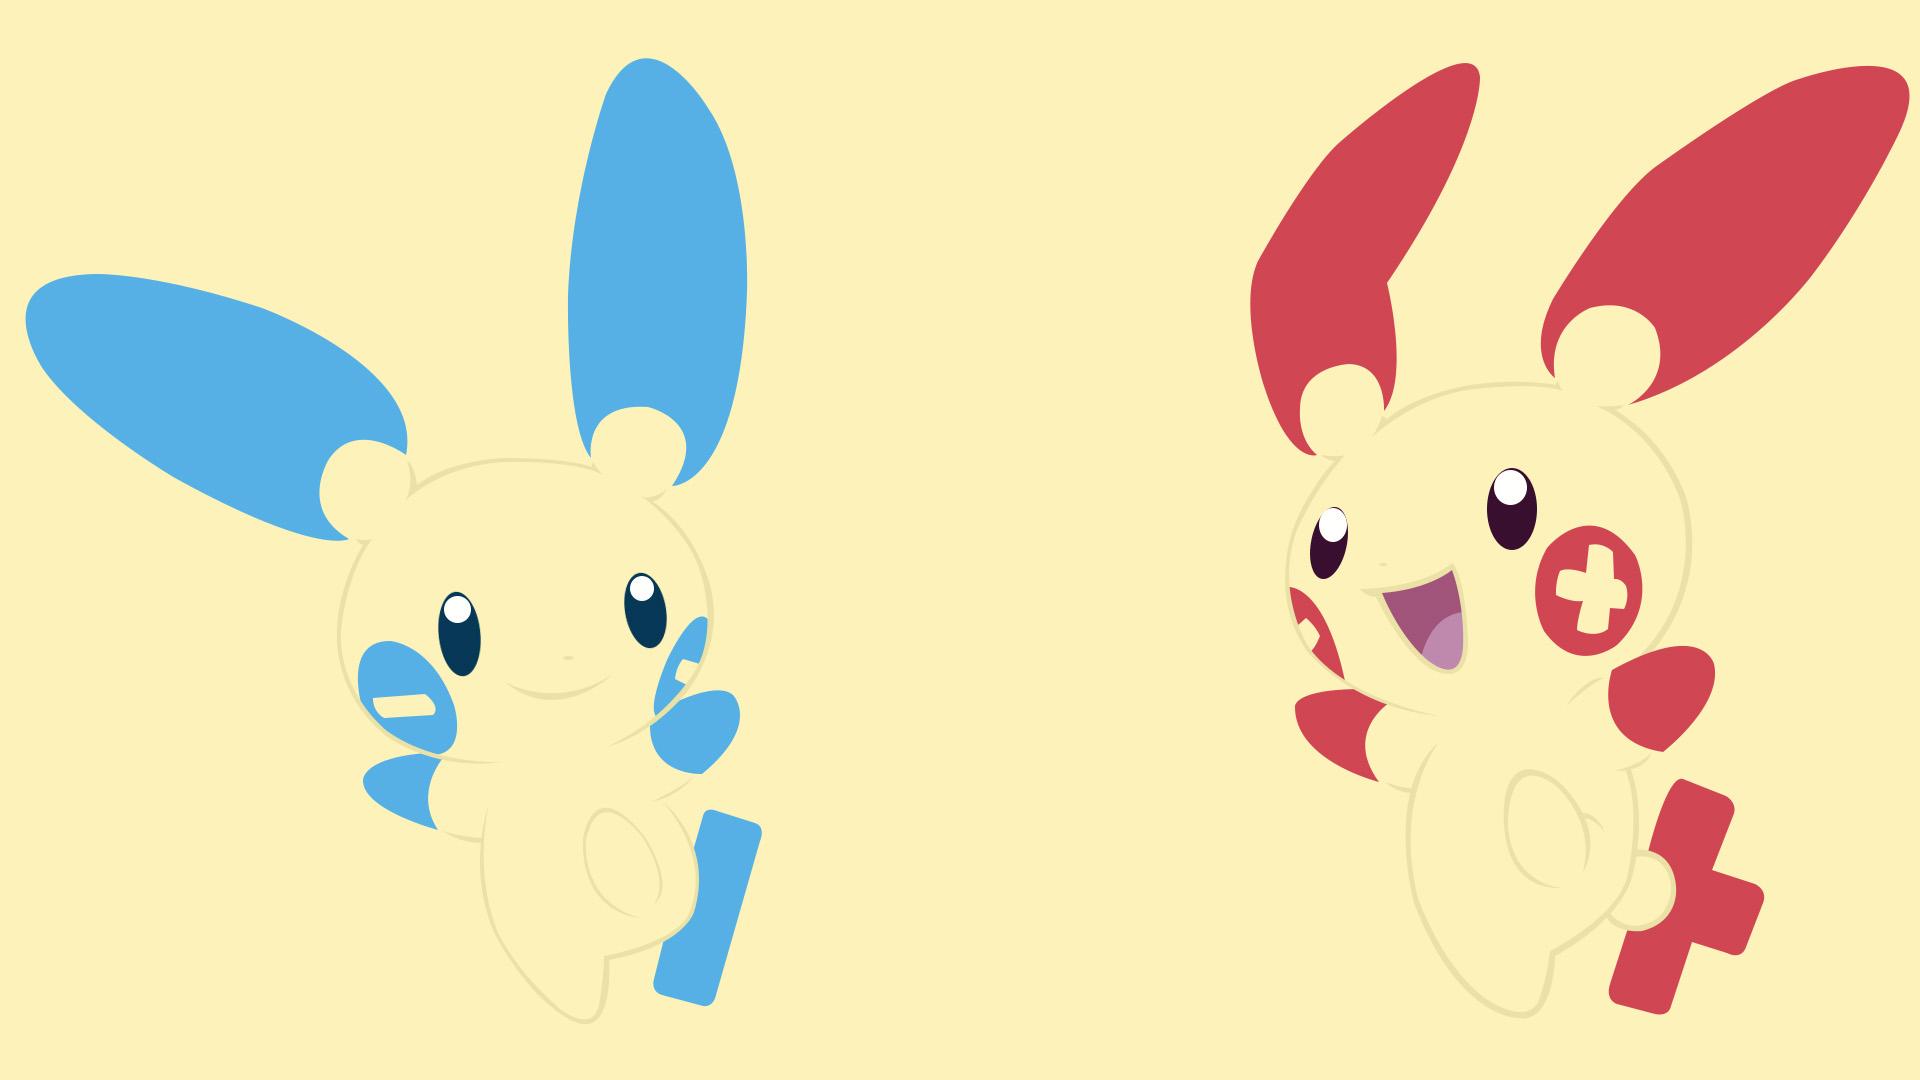 pikachu wallpaper iphone 4